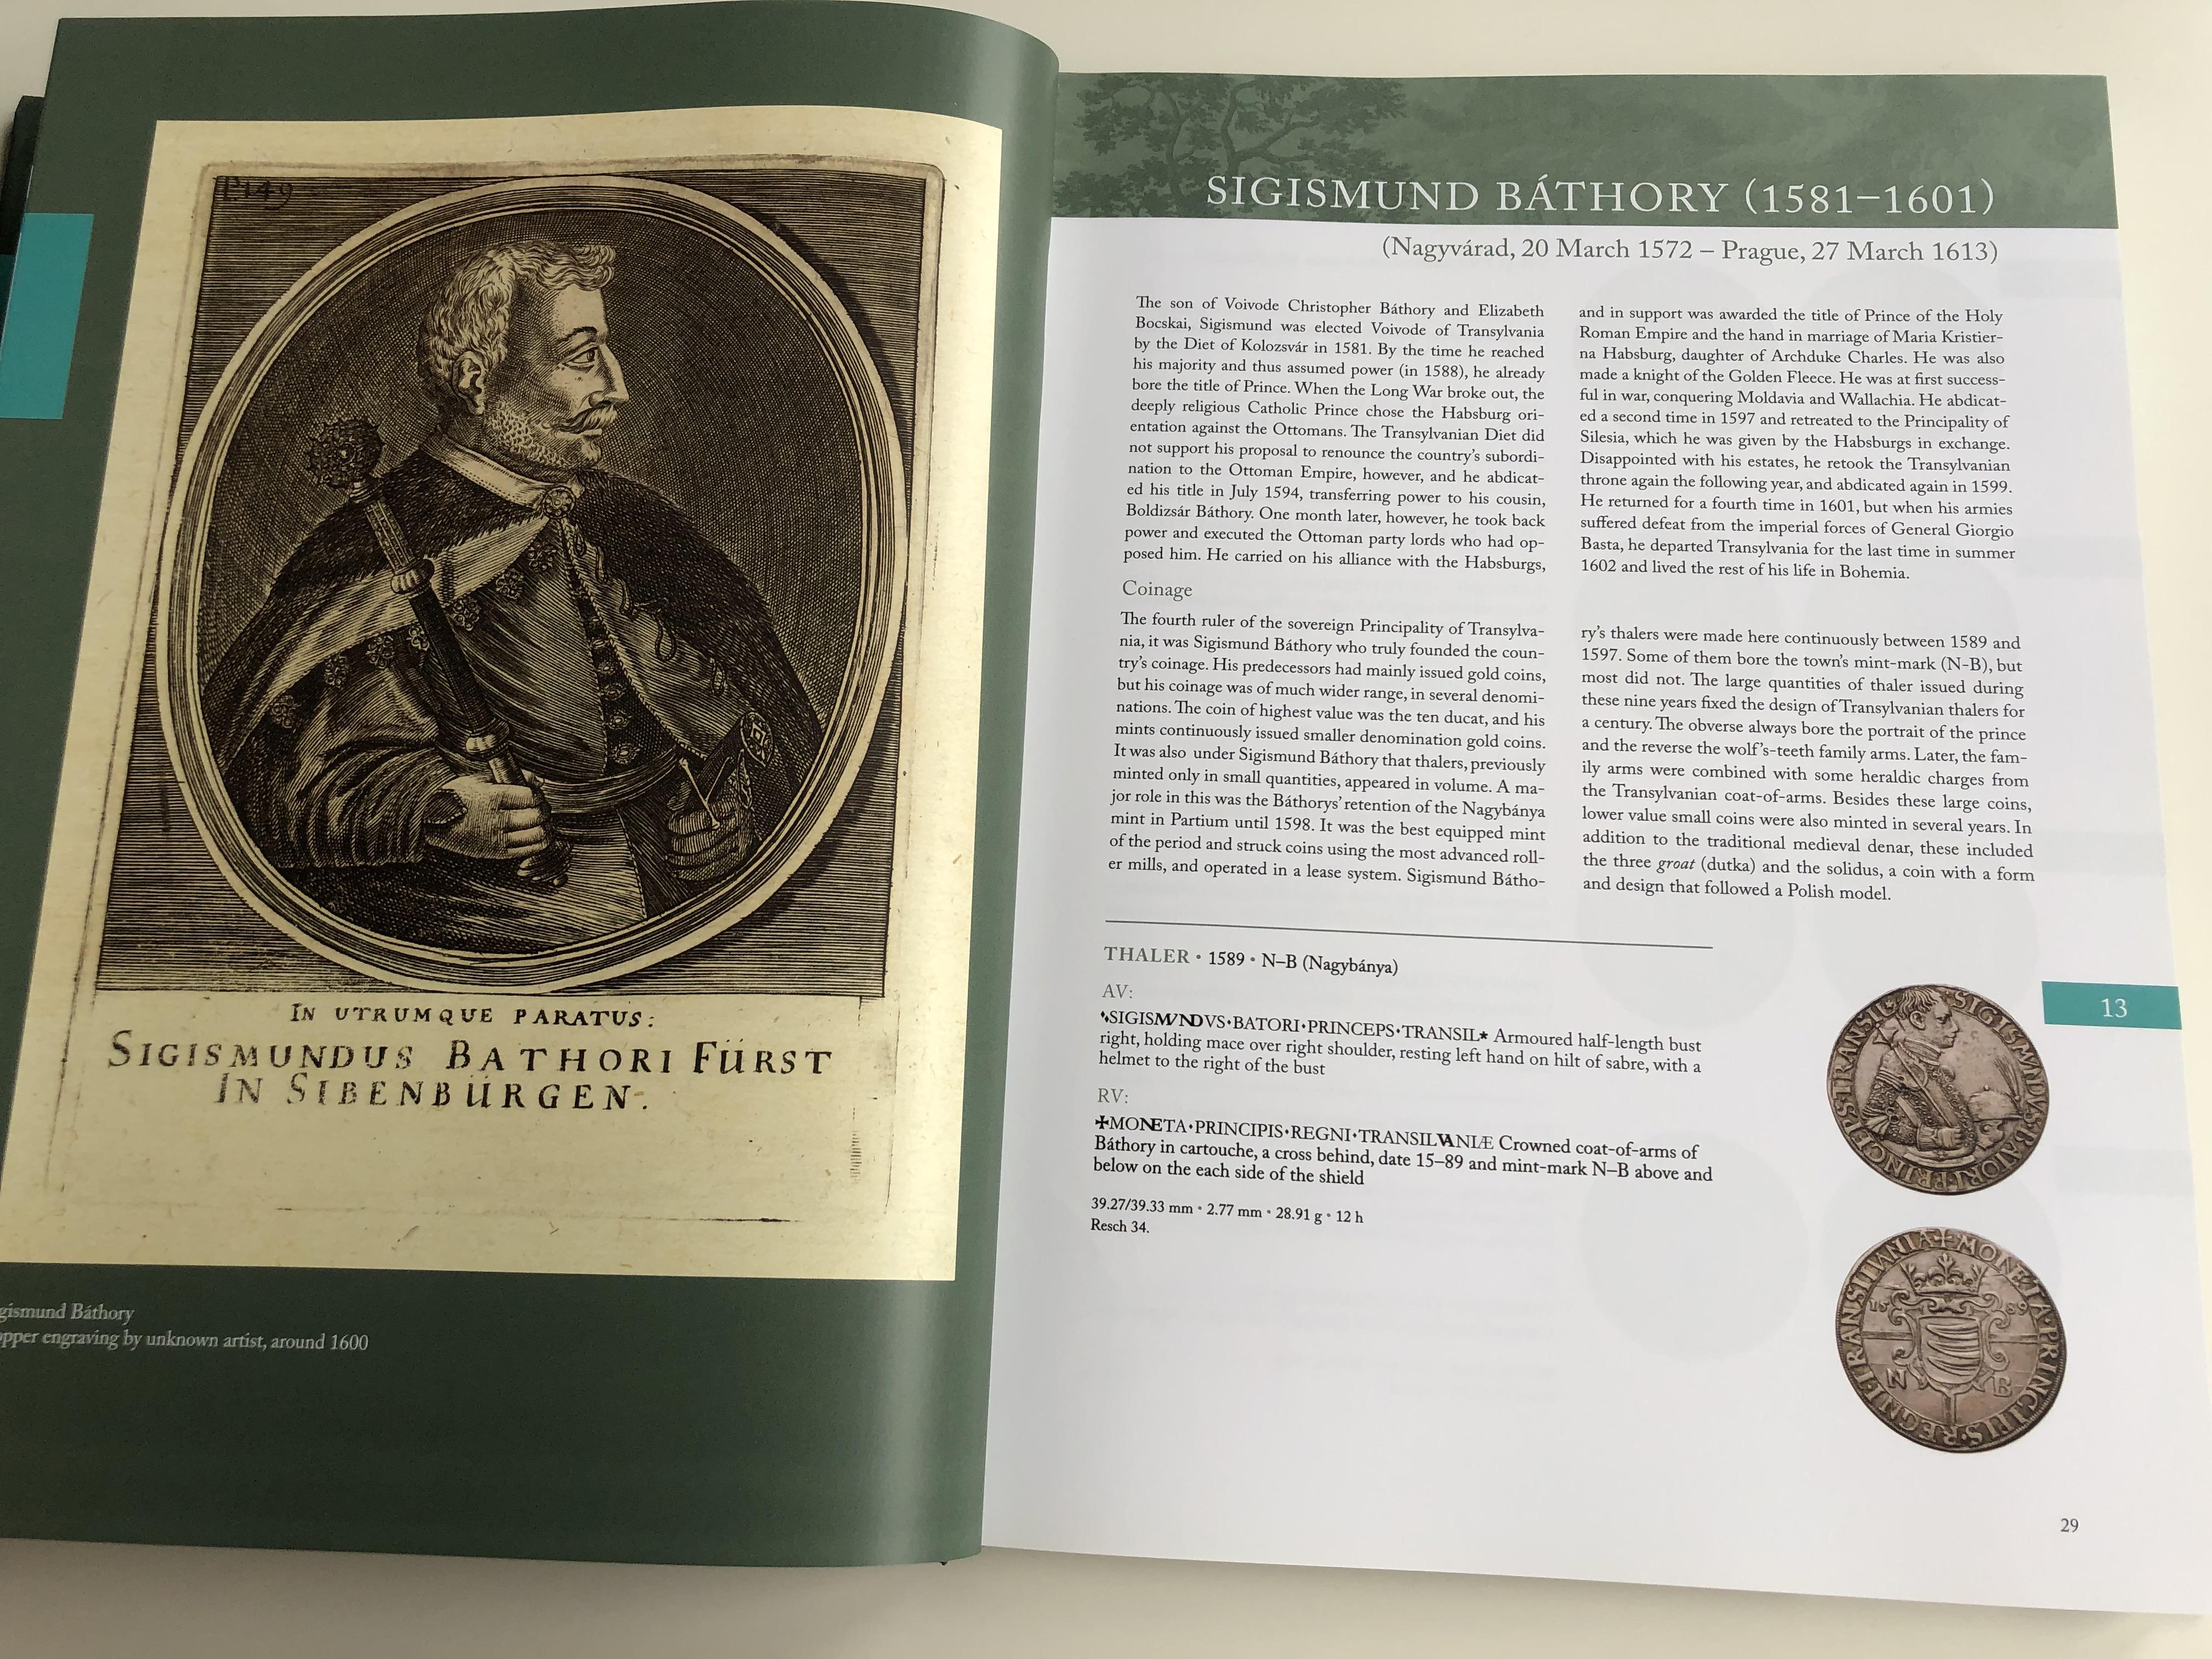 the-silver-of-fairyland-by-csaba-t-th-a-transylvanian-thaler-collection-in-the-magyar-nemzeti-bank-6.jpg